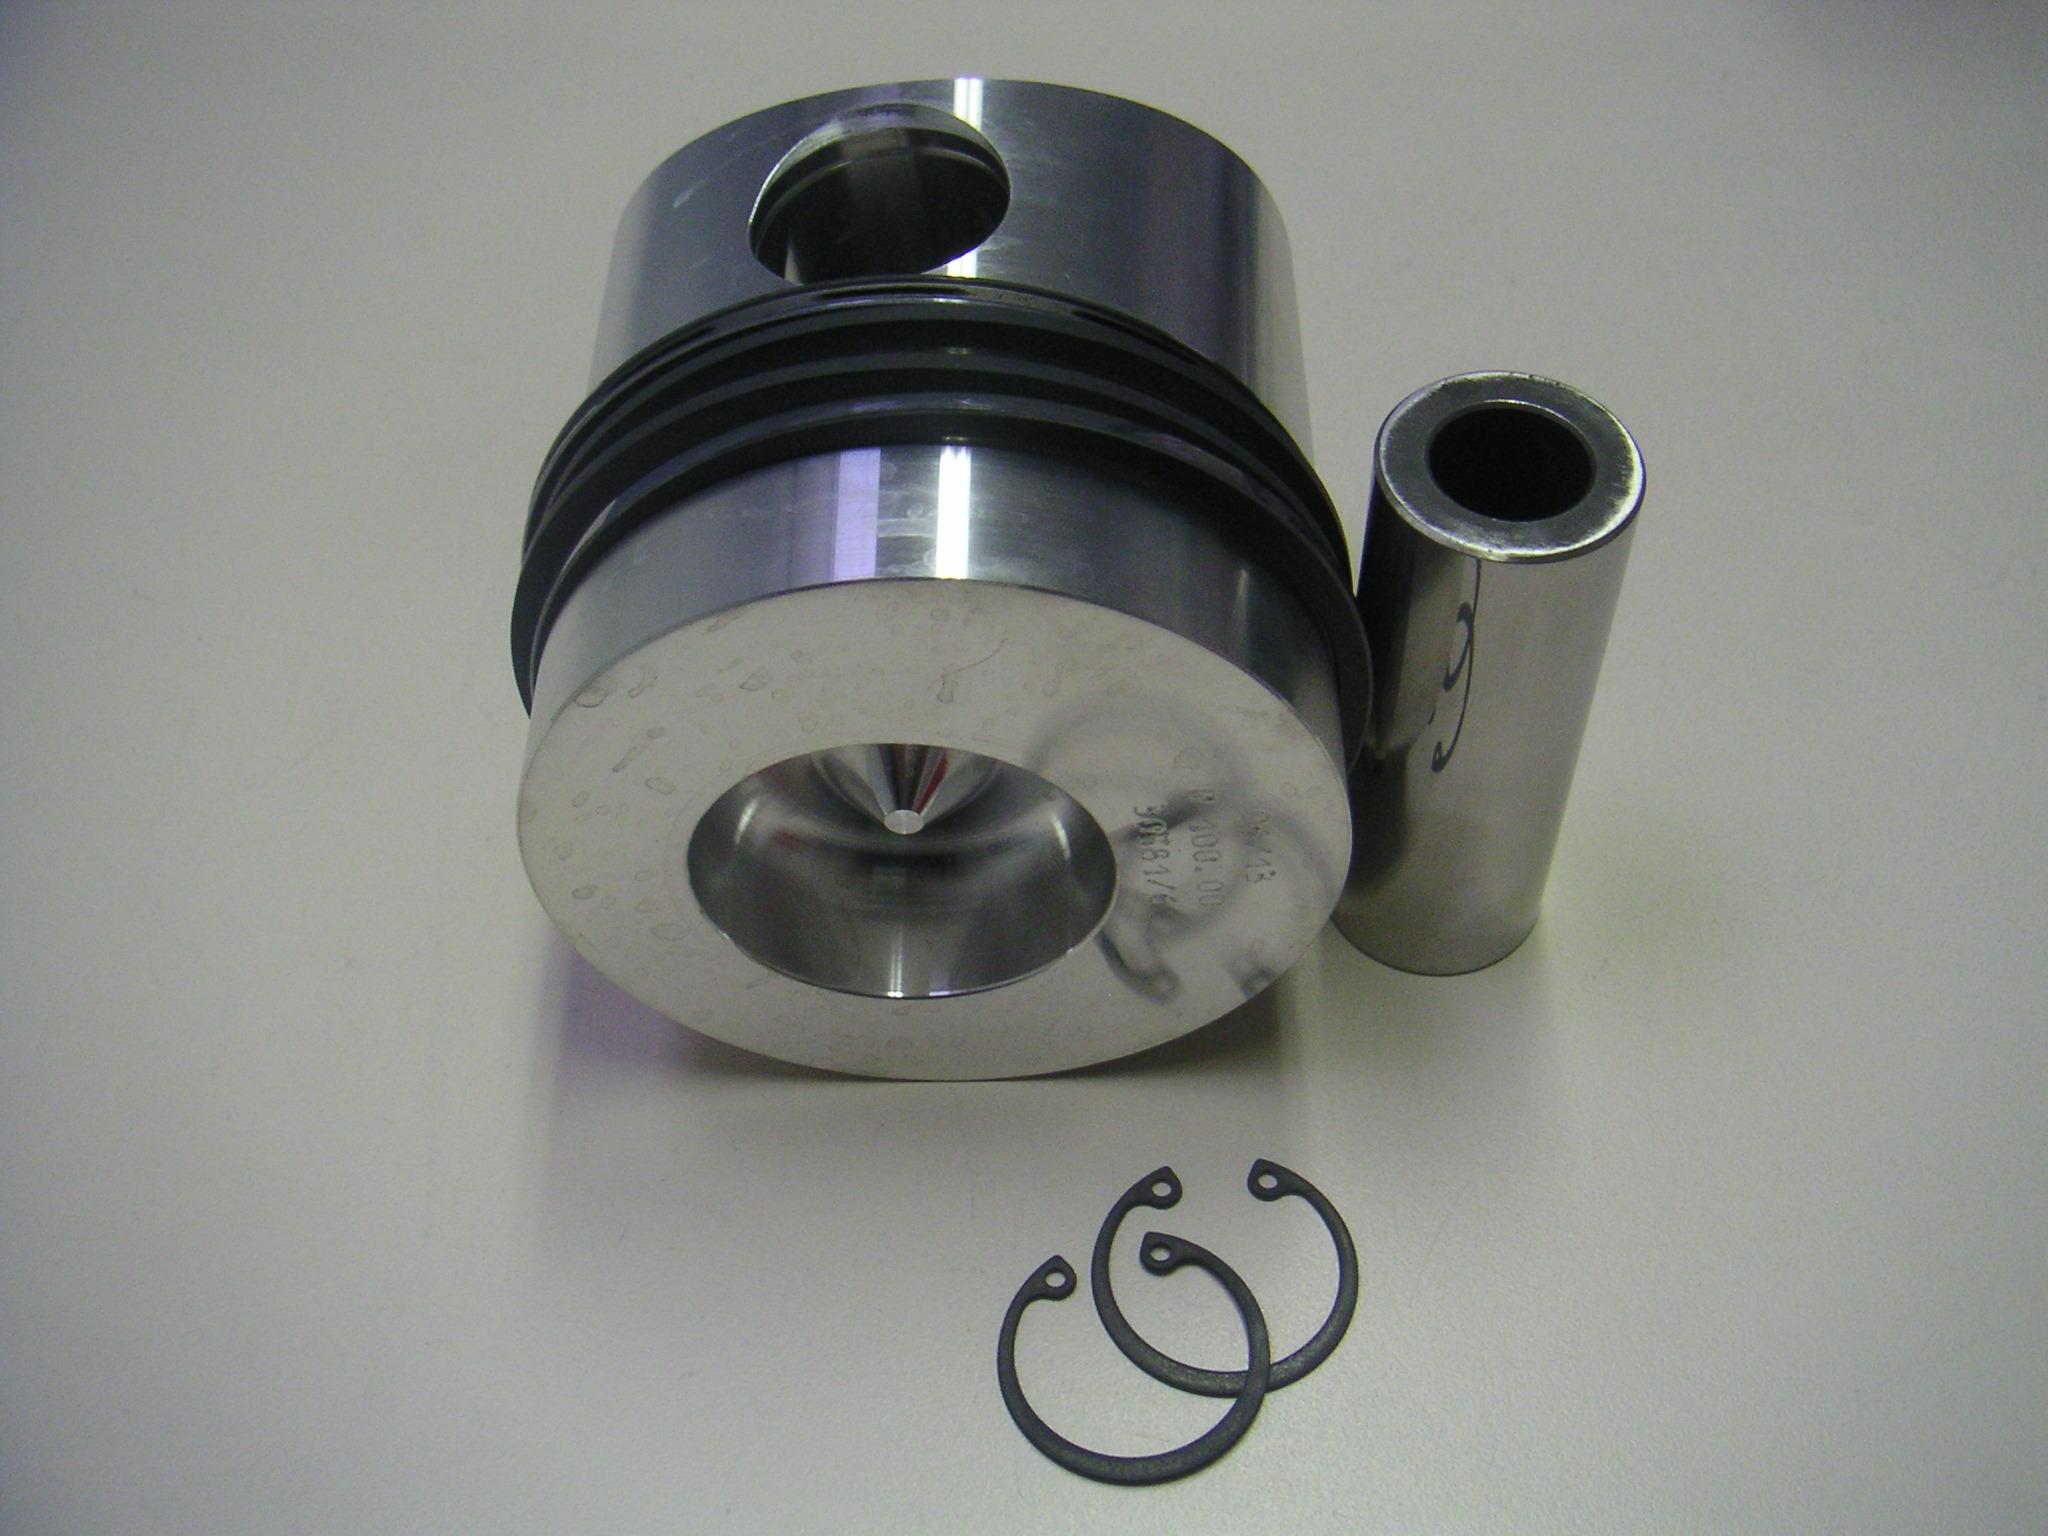 Piston complet LDA832 LDA833 LDA834 5LD825-2 Ø100.00mm - Adaptable LOMBARDINI (FIN175PC00 - 3058104003 - 6500154)